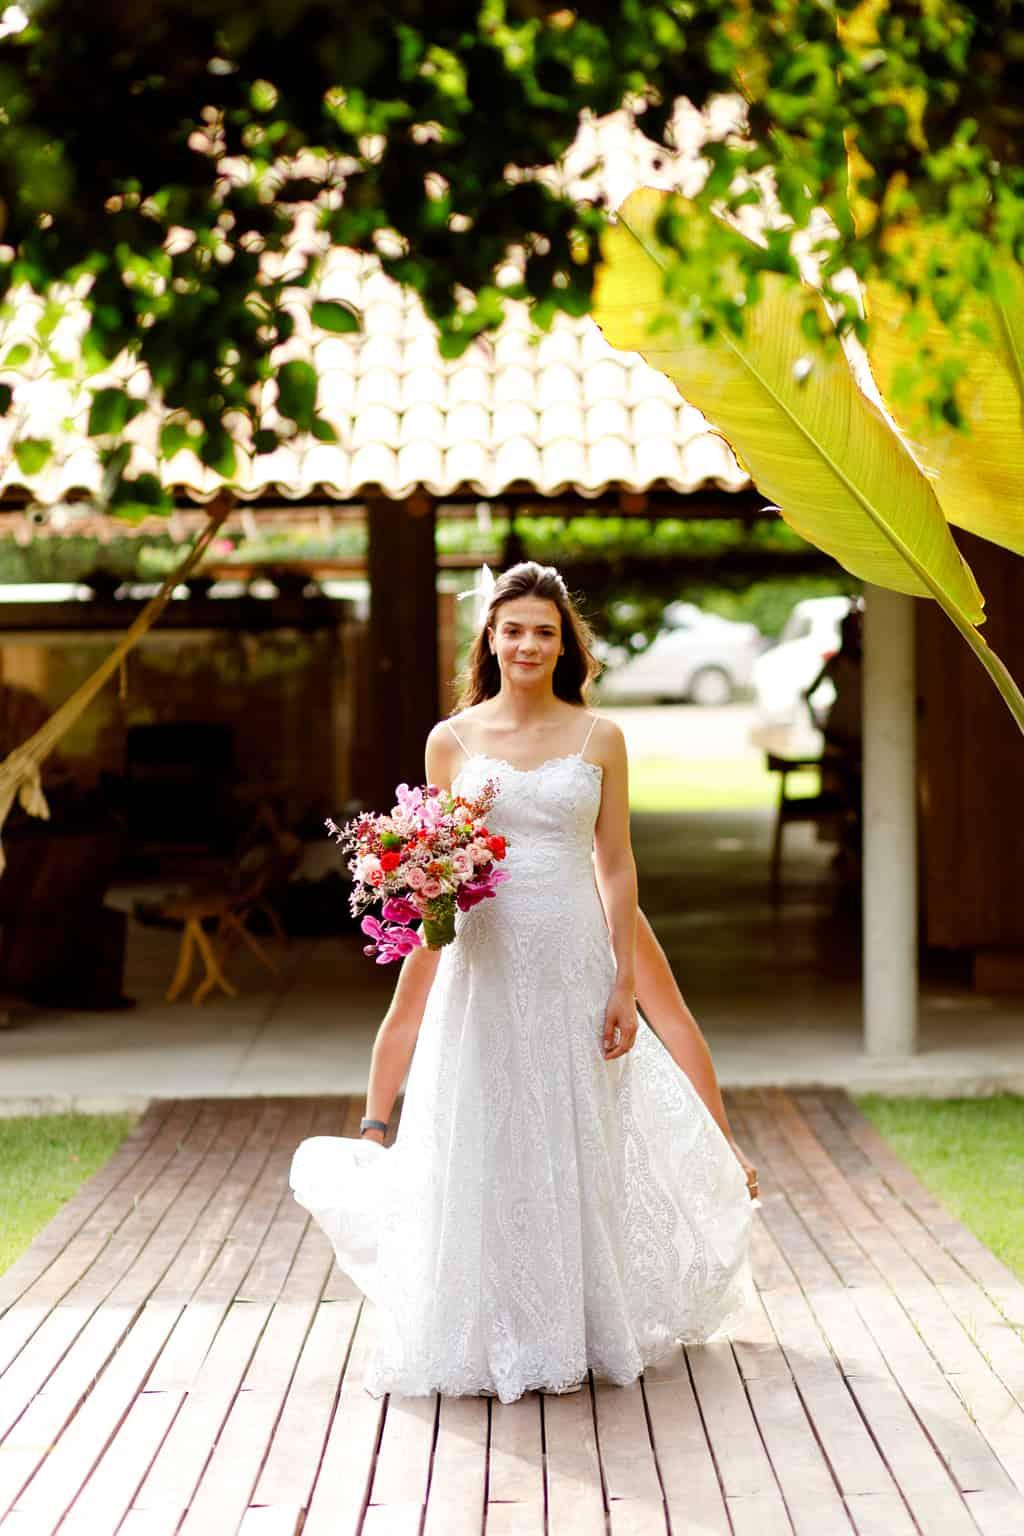 Casamento-Emanuelle-e-Alysson-Fotografia-Tadeu-Nanó-e-Luca-Antunes-484